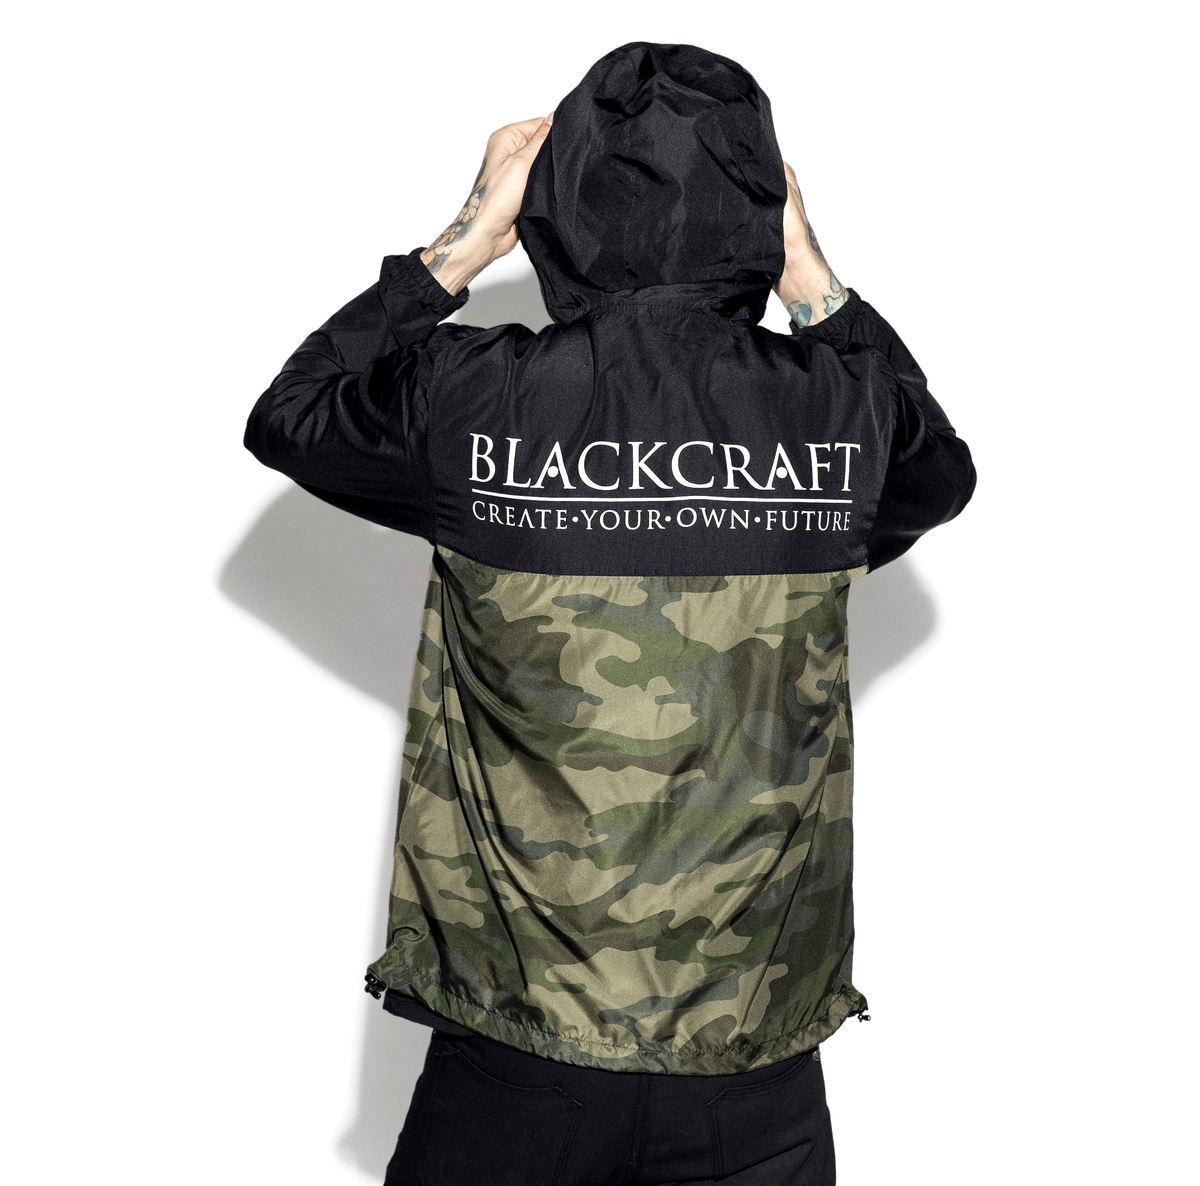 bunda (unisex) BLACK CRAFT - Staple Black on Camo - WB007SB